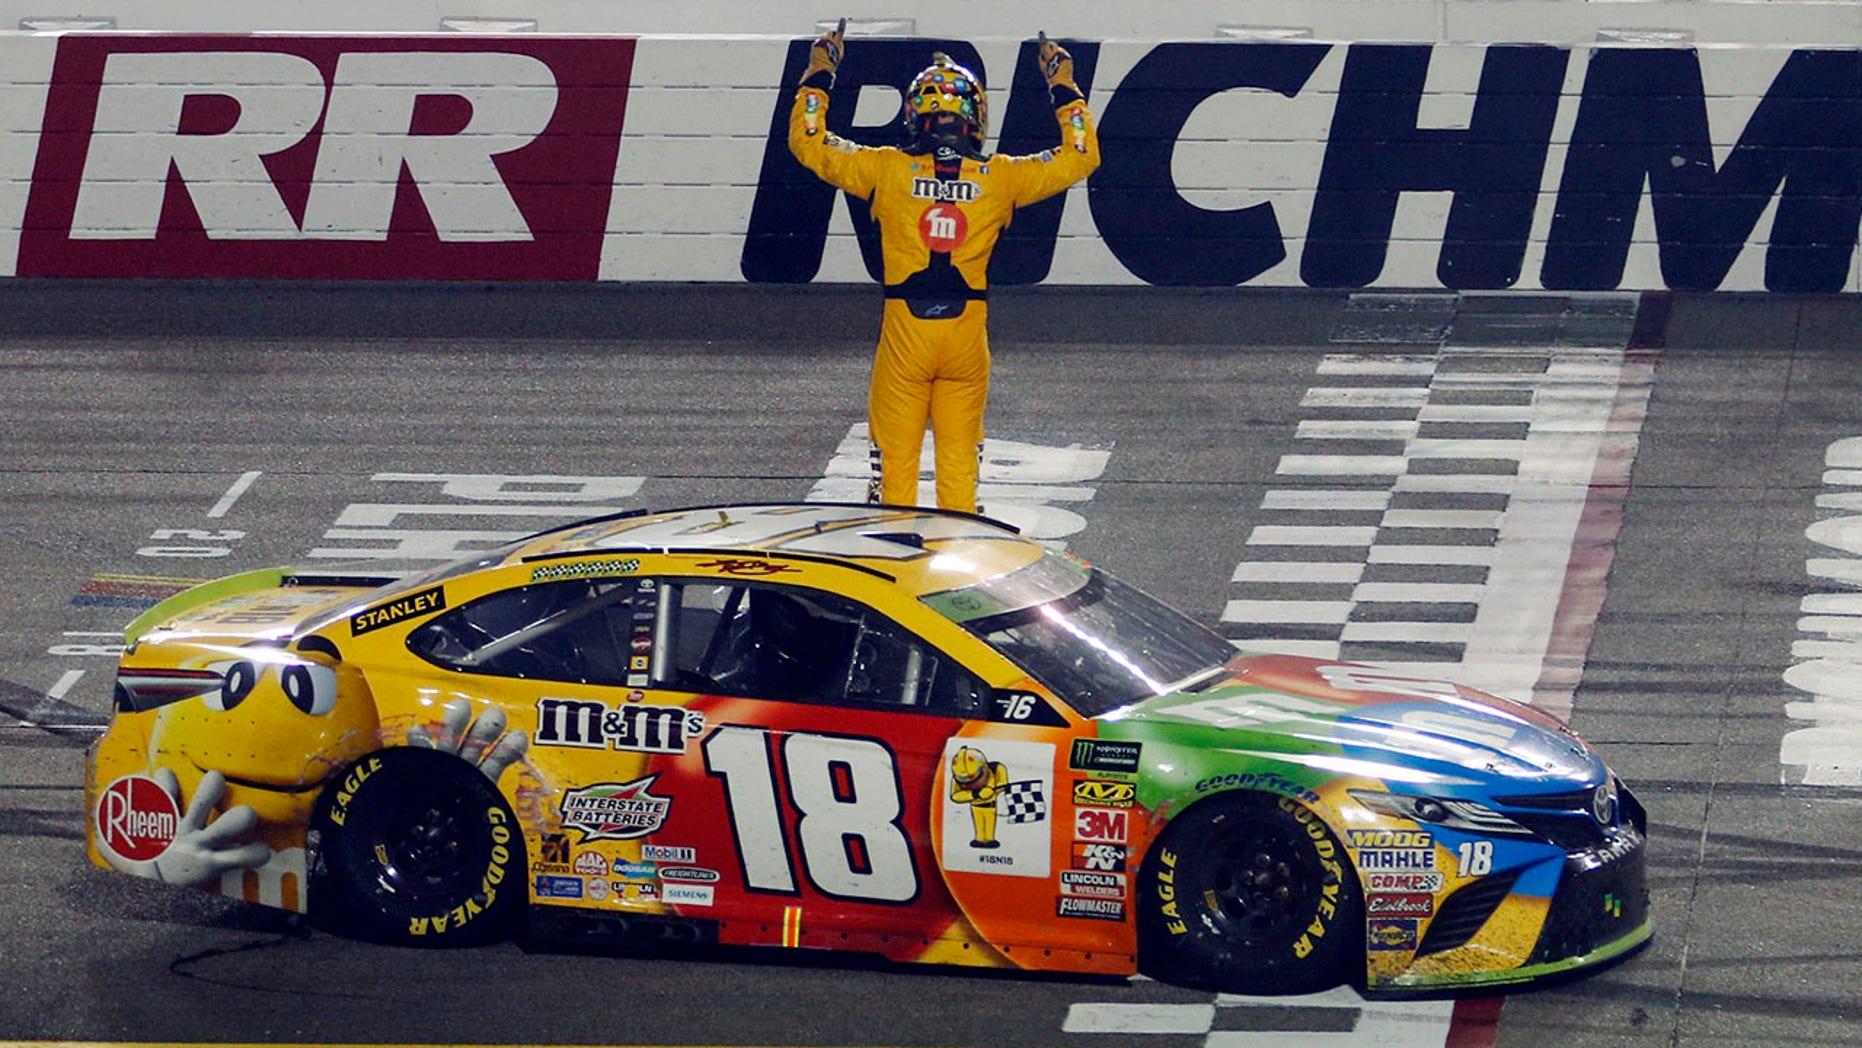 Kyle Busch (18) celebrates winning the NASCAR Cup Series auto race at Richmond Raceway in Richmond, Va., Saturday, Sept. 22, 2018. (AP Photo/Steve Helber)